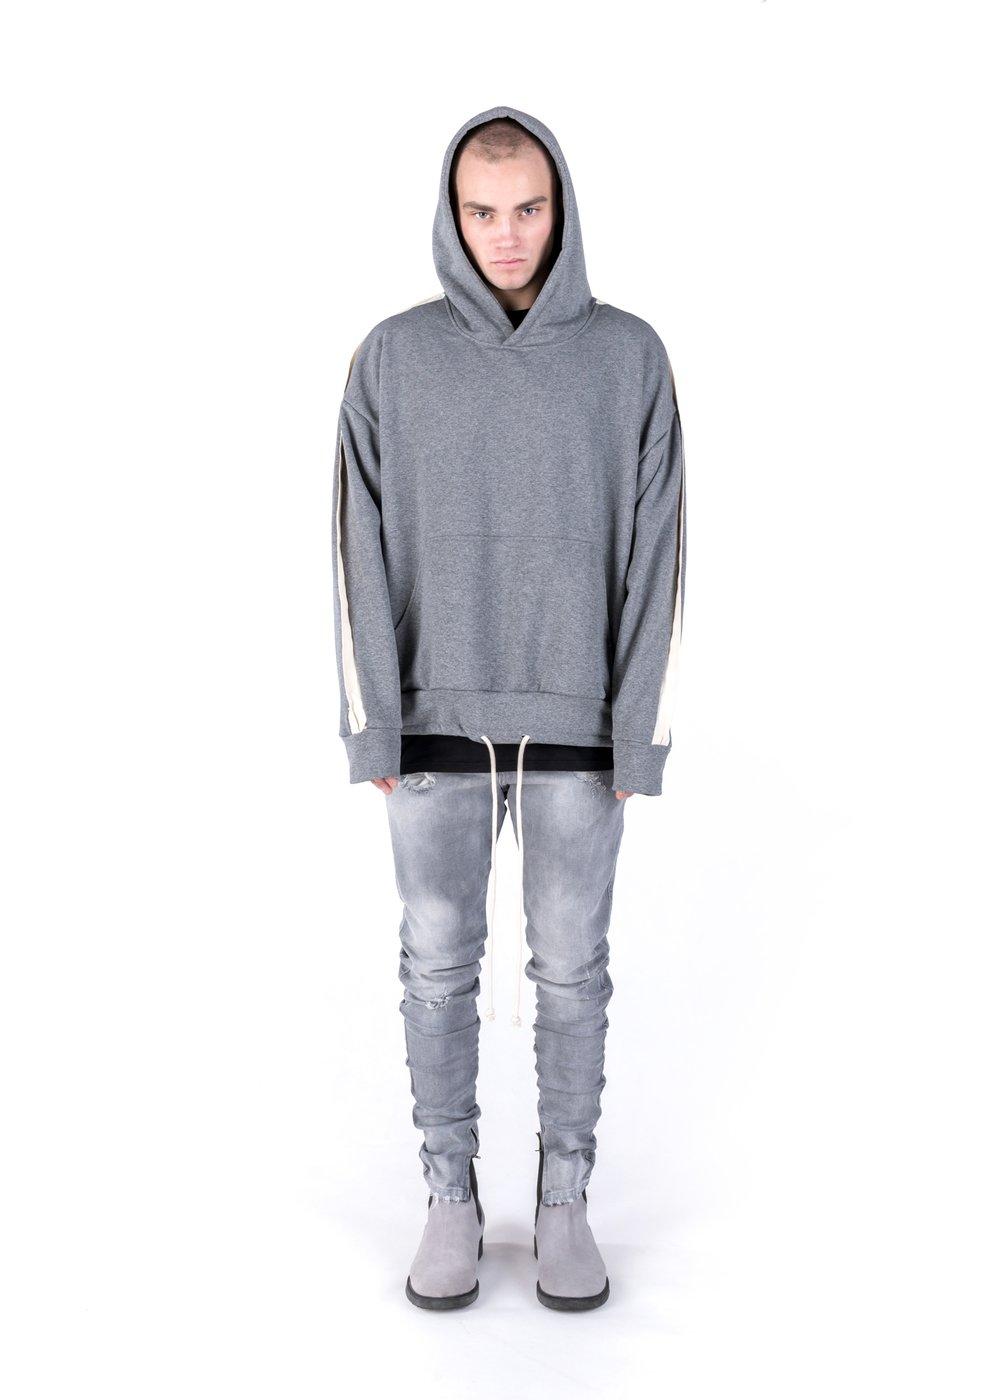 Image of U-F / Urban Flavours Oversized Stripe Hoodie Gray